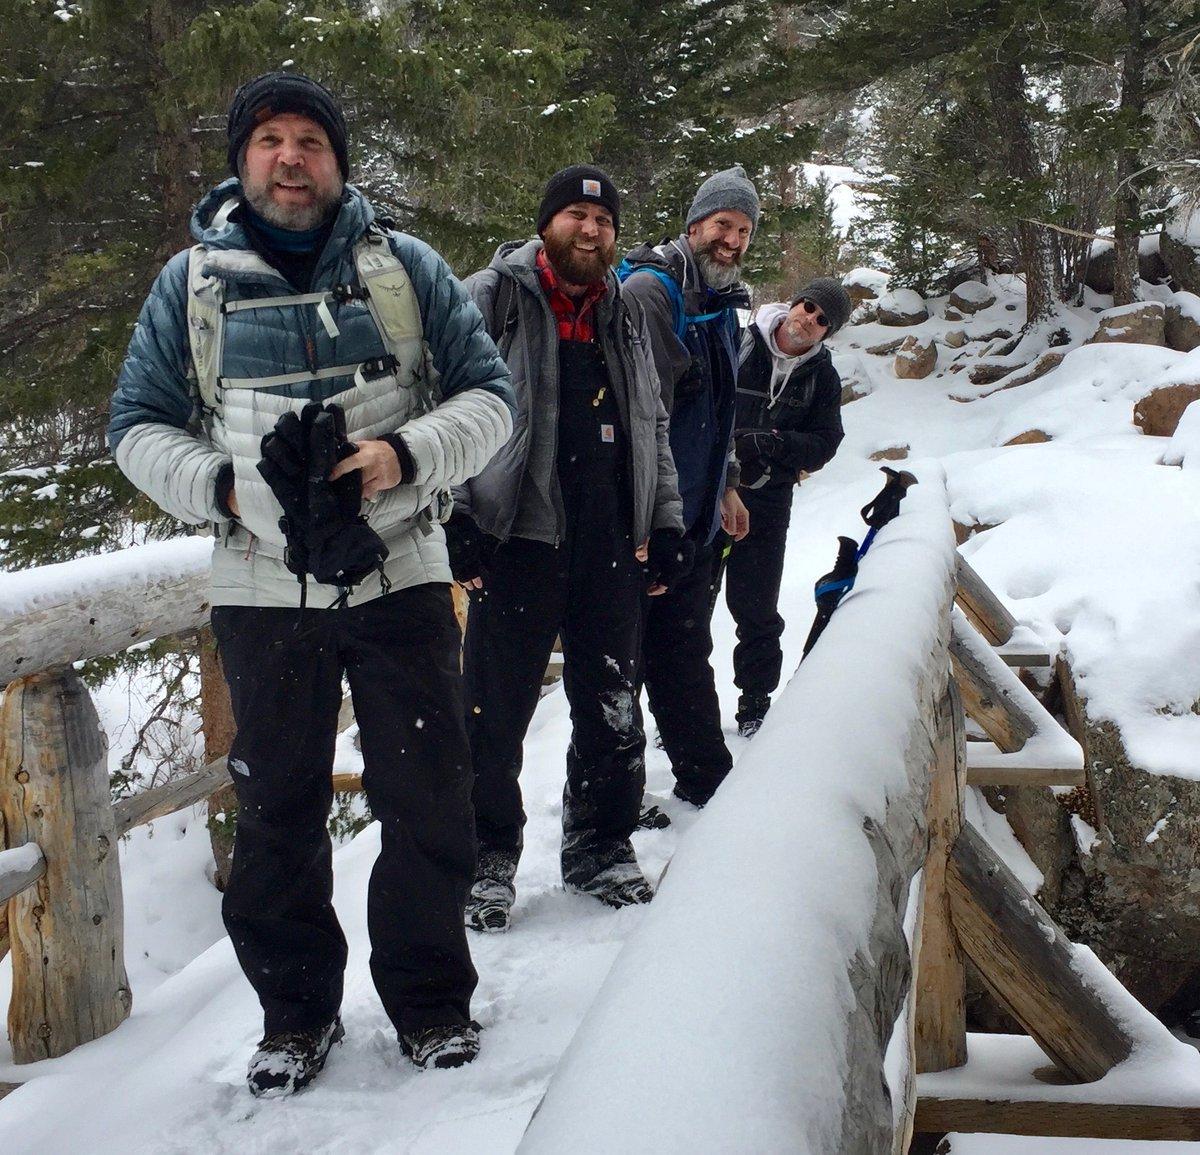 @RockyNPS, thanks for a great few days of hiking. You were beautiful, as always. #OptOutsidepic.twitter.com/HA6Dusje10